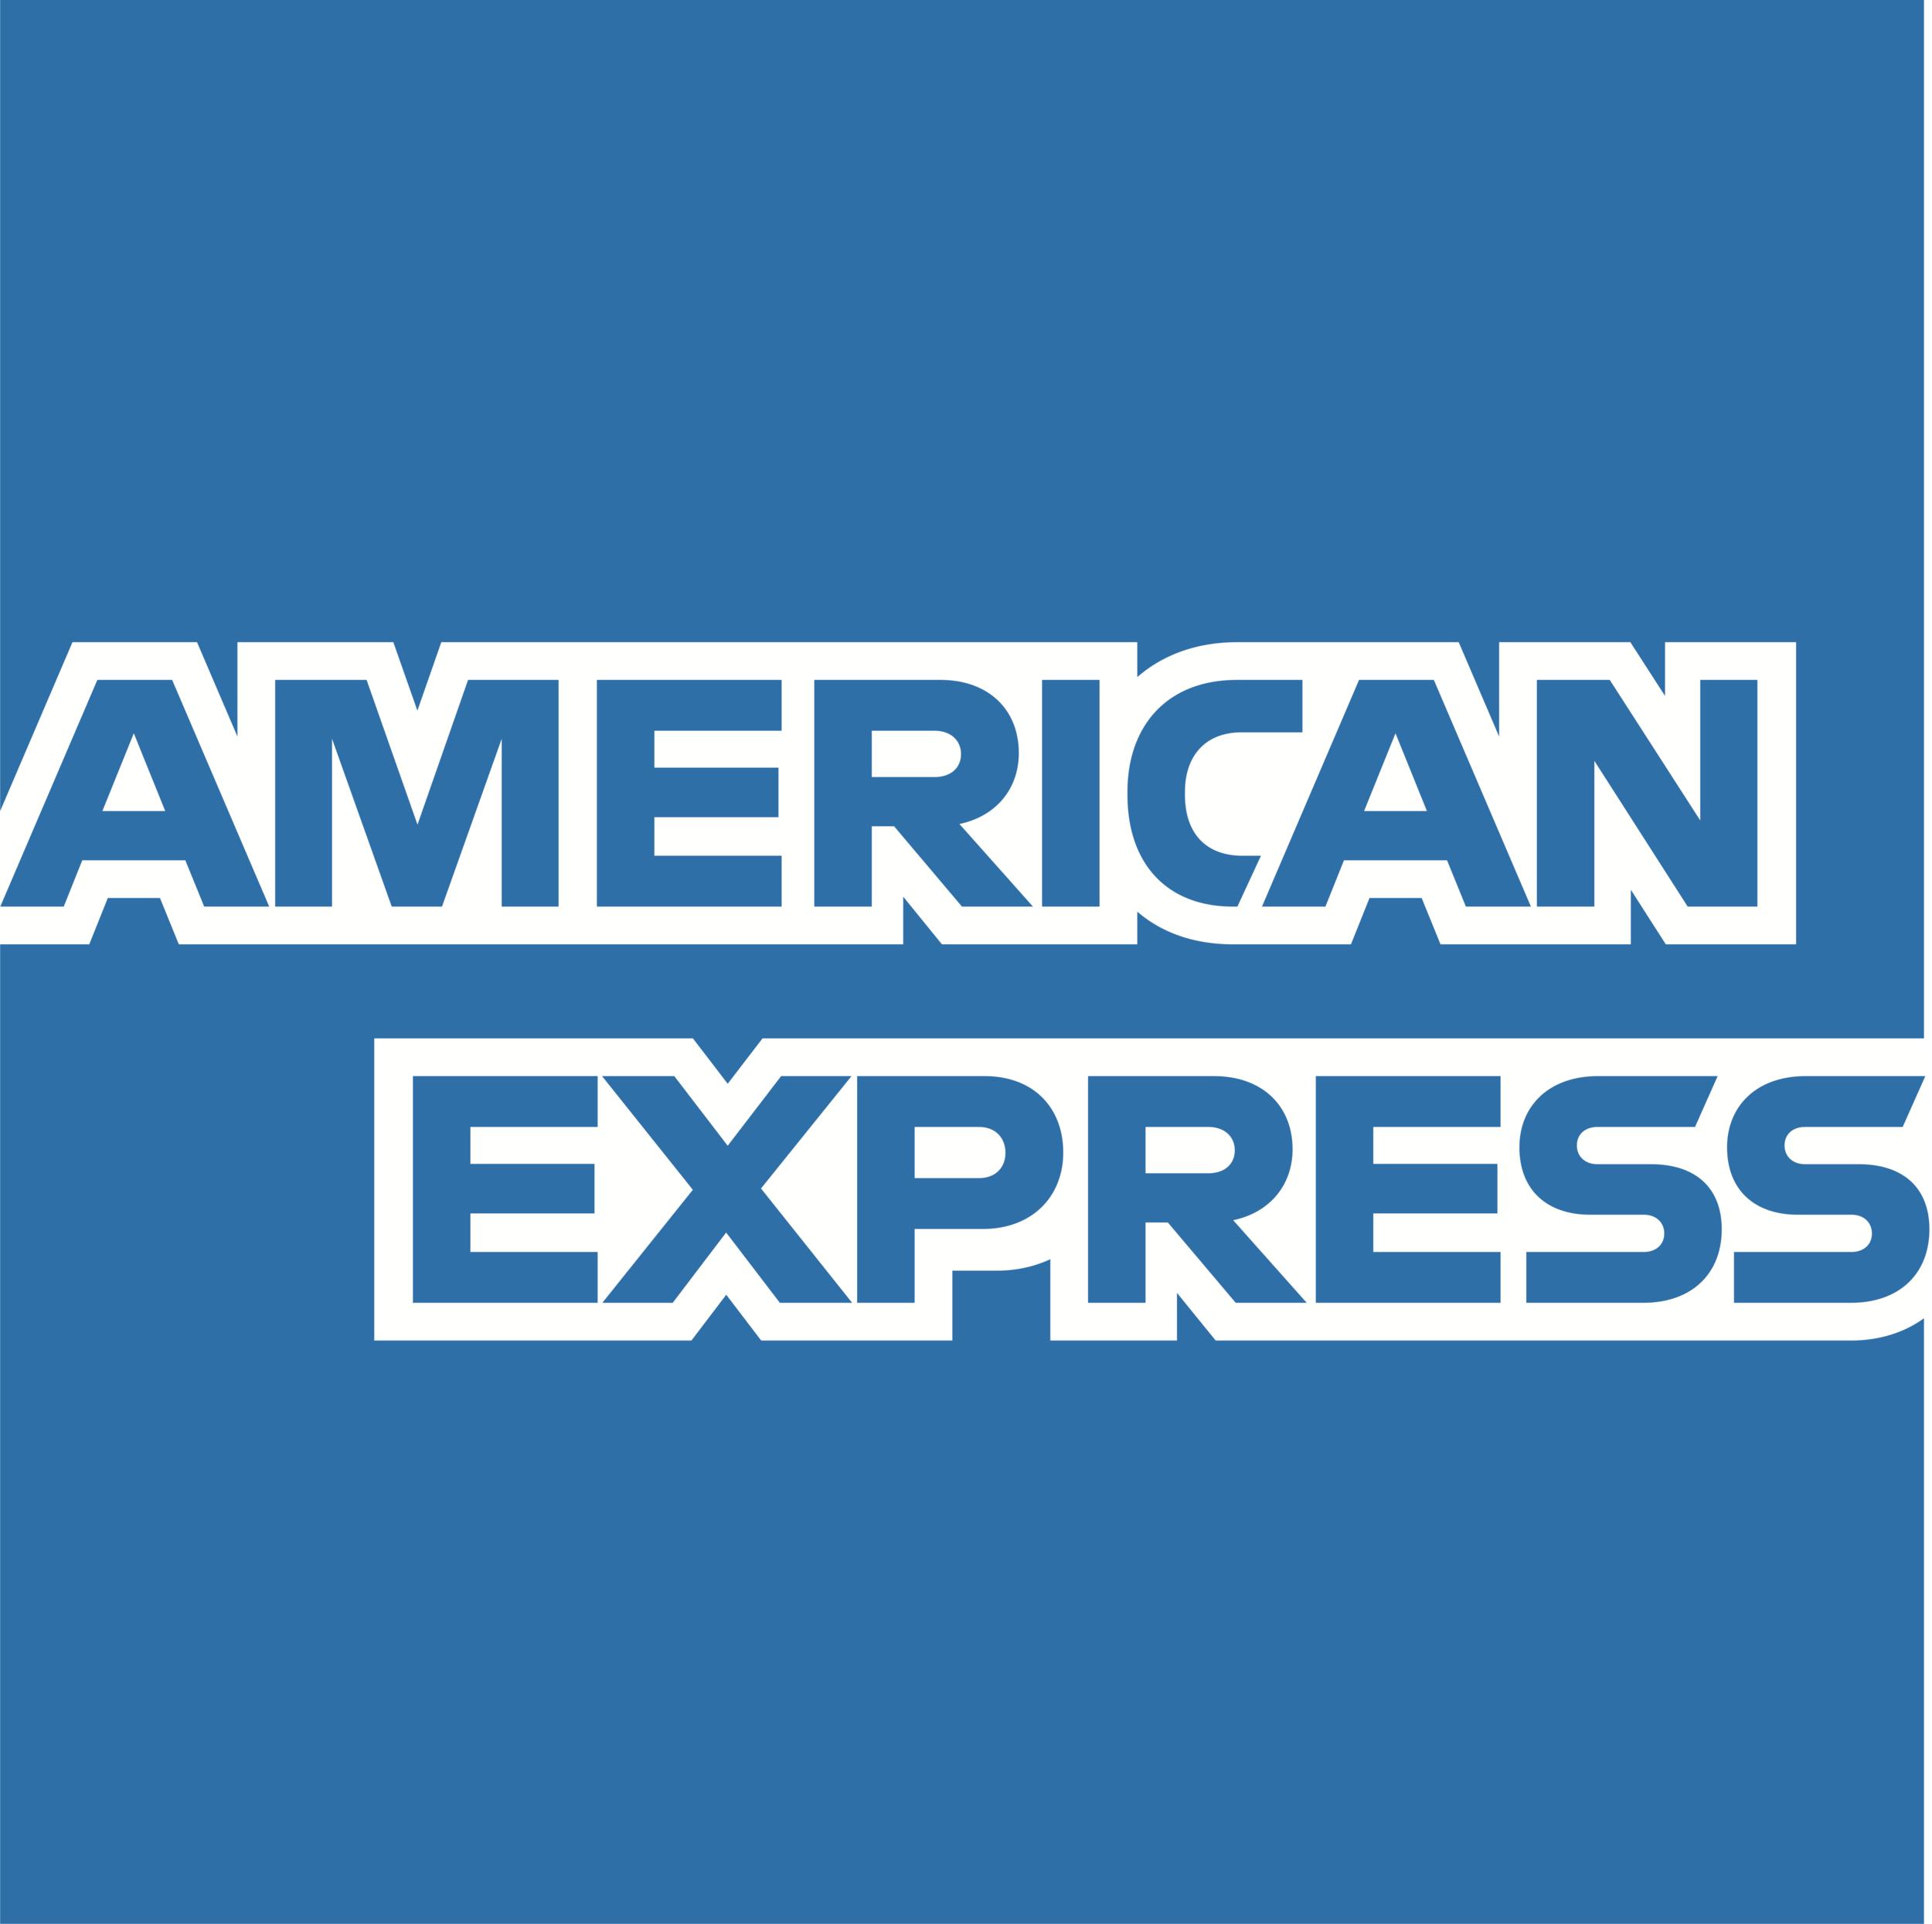 AXP_BlueBoxLogo_EXTRALARGEscale_CMYK_PE.png